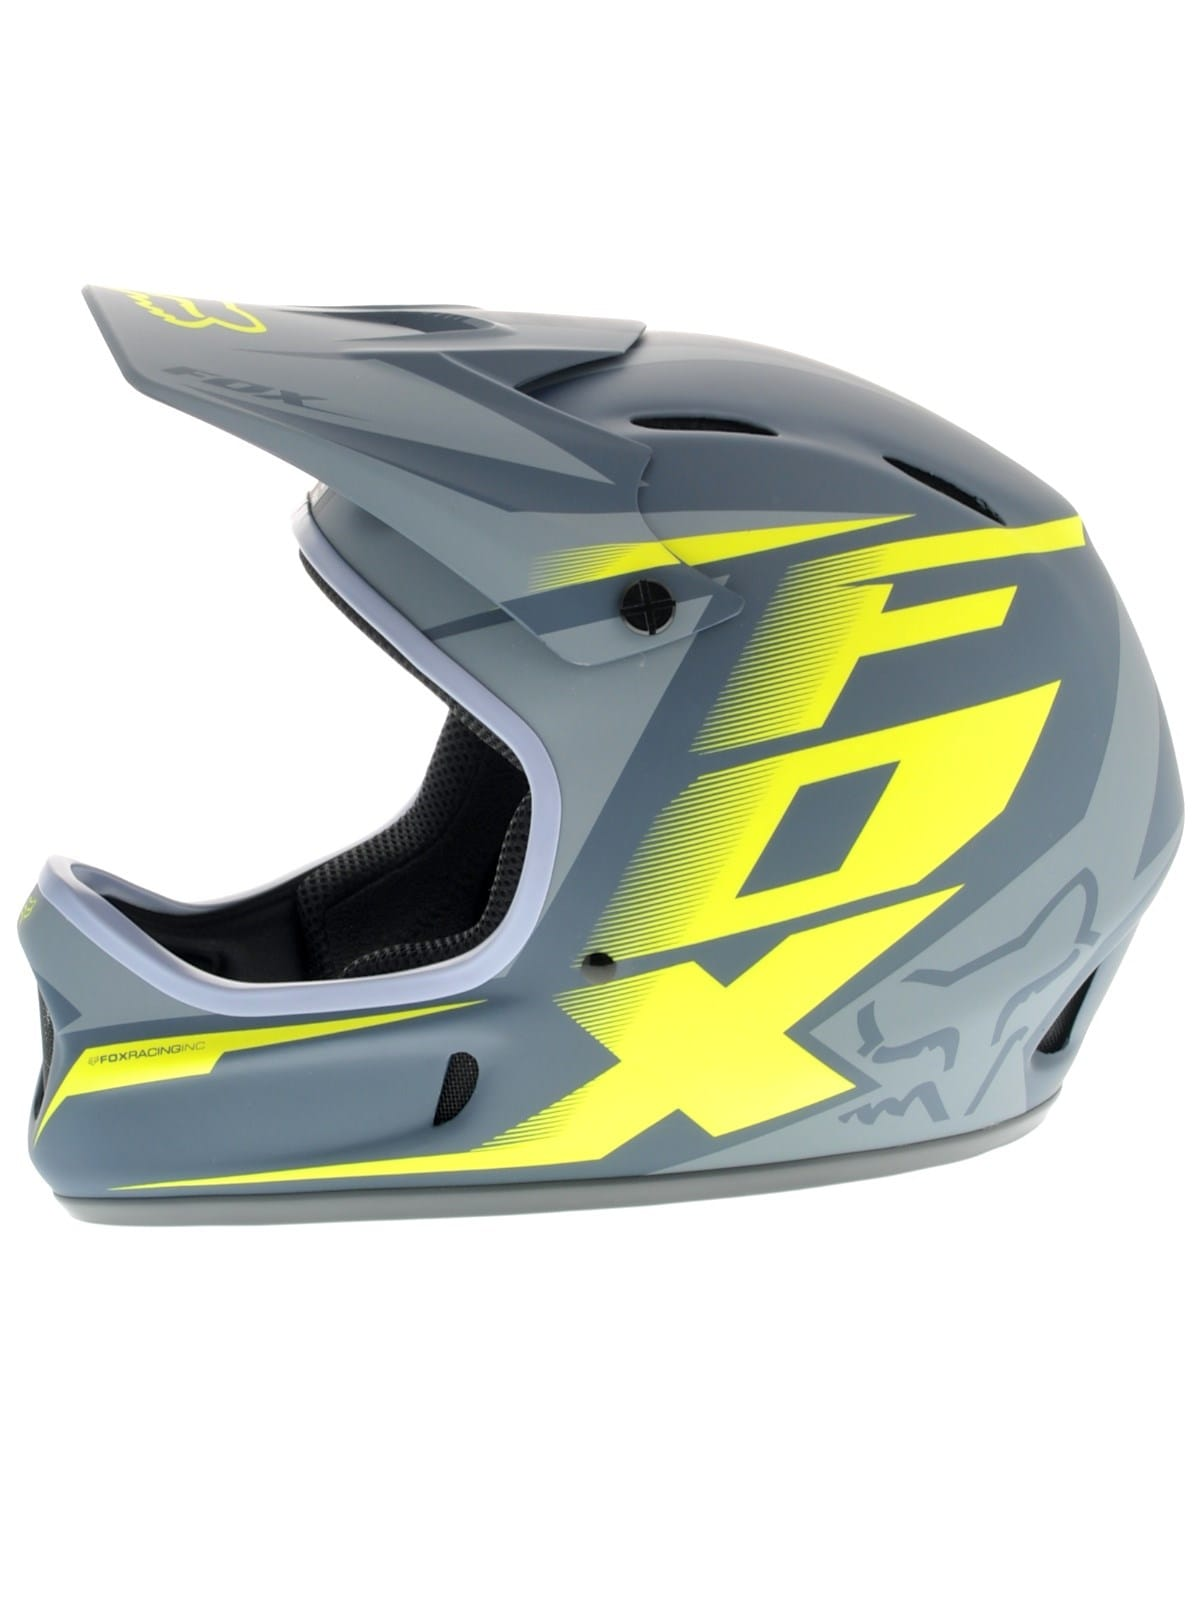 fox rampage dh helmet all terrain cycles. Black Bedroom Furniture Sets. Home Design Ideas